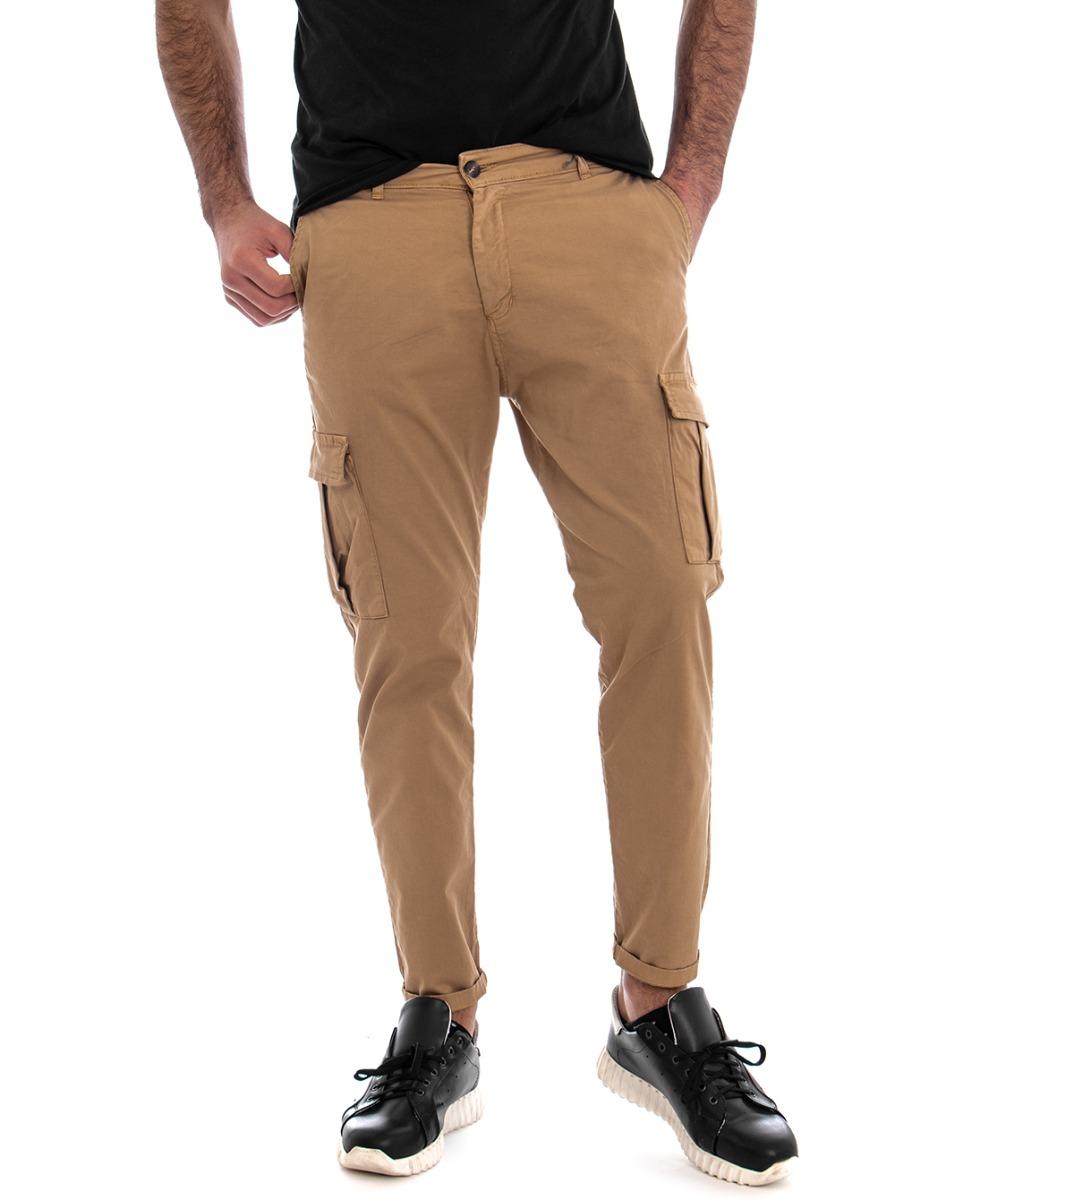 Pantalone-Uomo-Cargo-Tasca-America-Kaki-Tinta-Unita-Cotone-Casual-GIOSAL